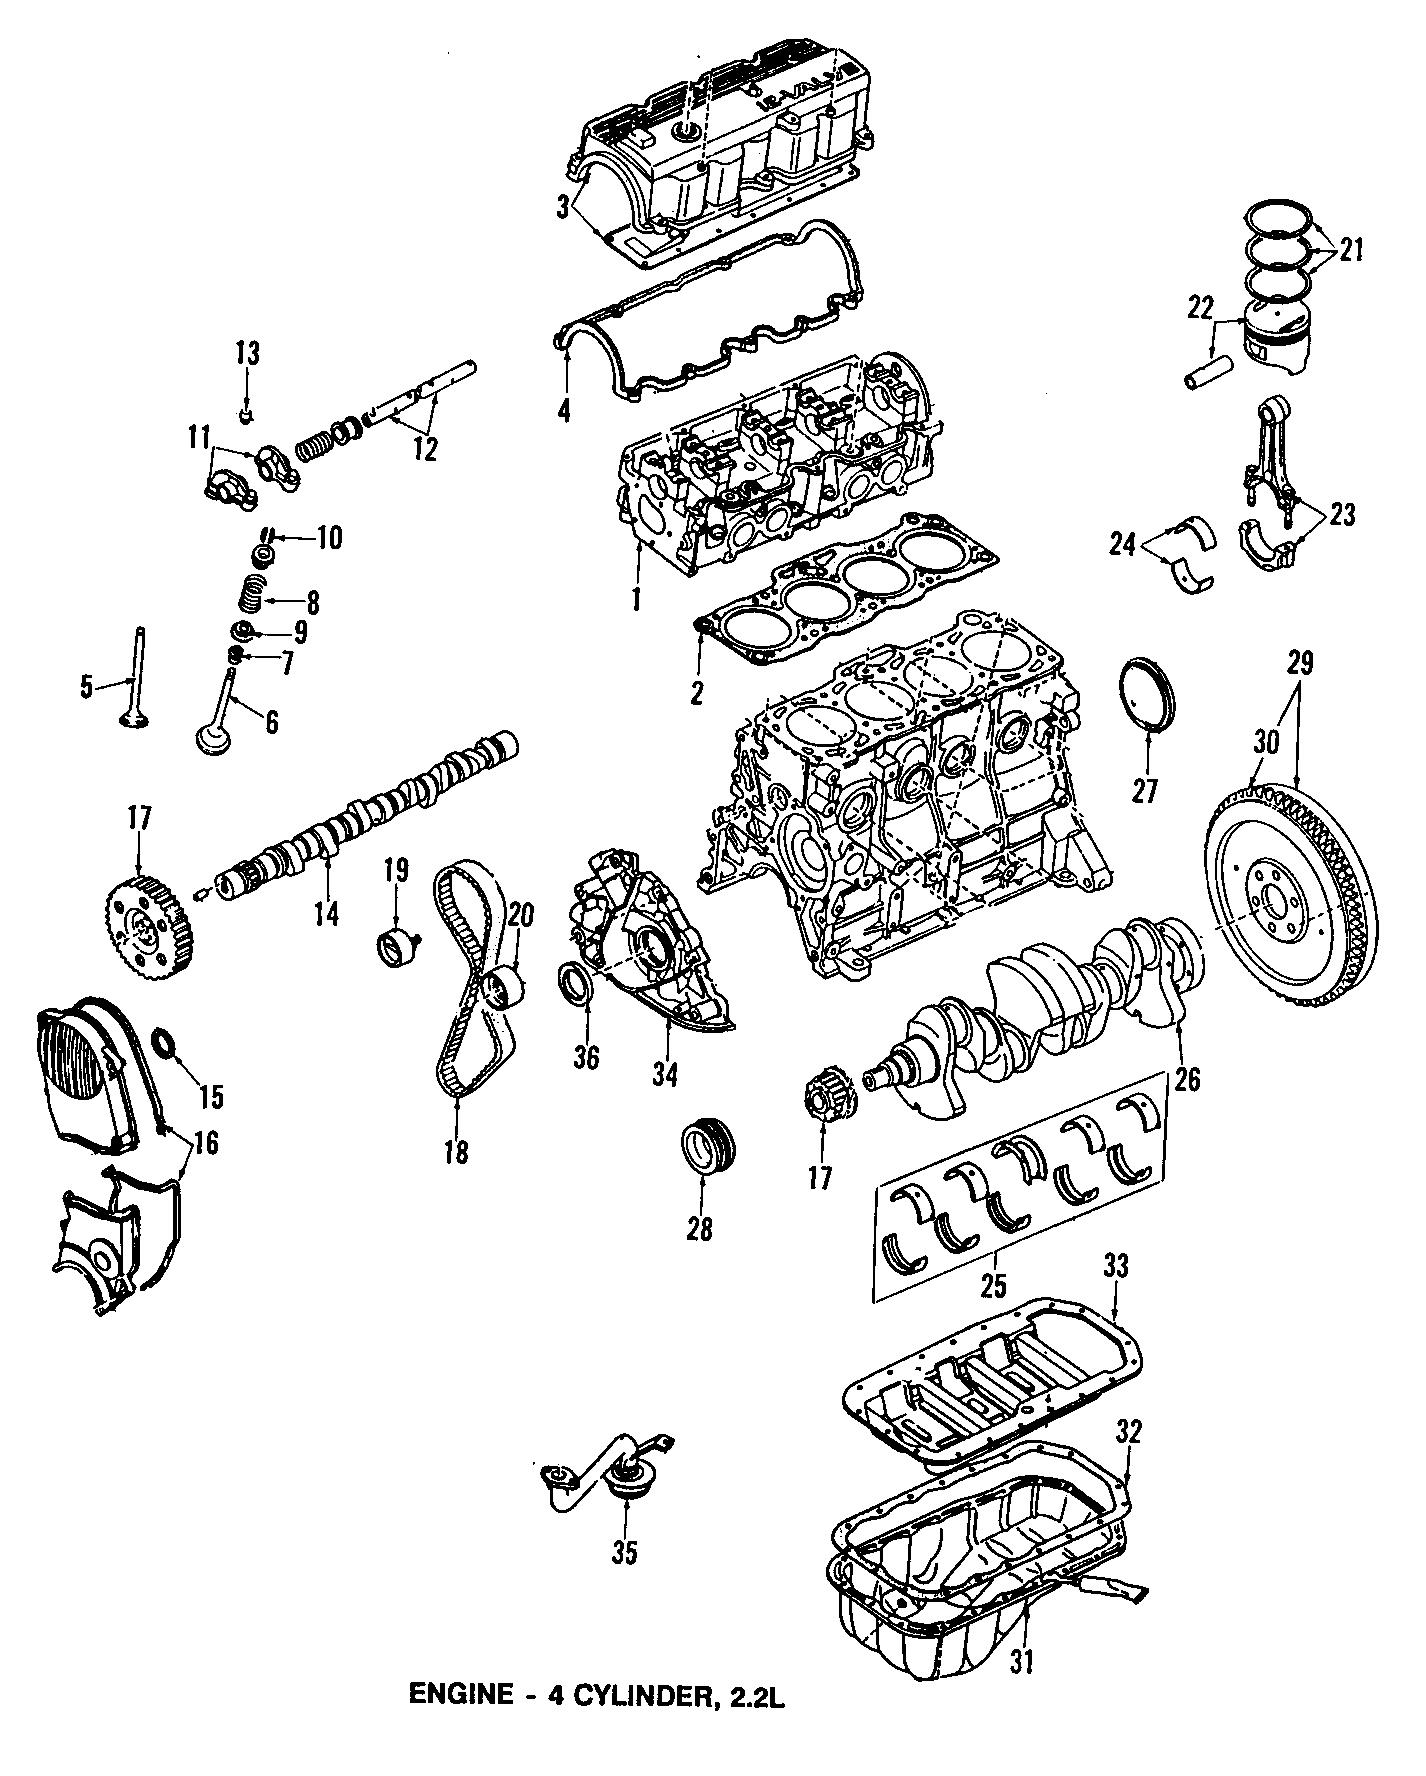 1987 mazda b2200 crankshaft gear  engine timing crankshaft